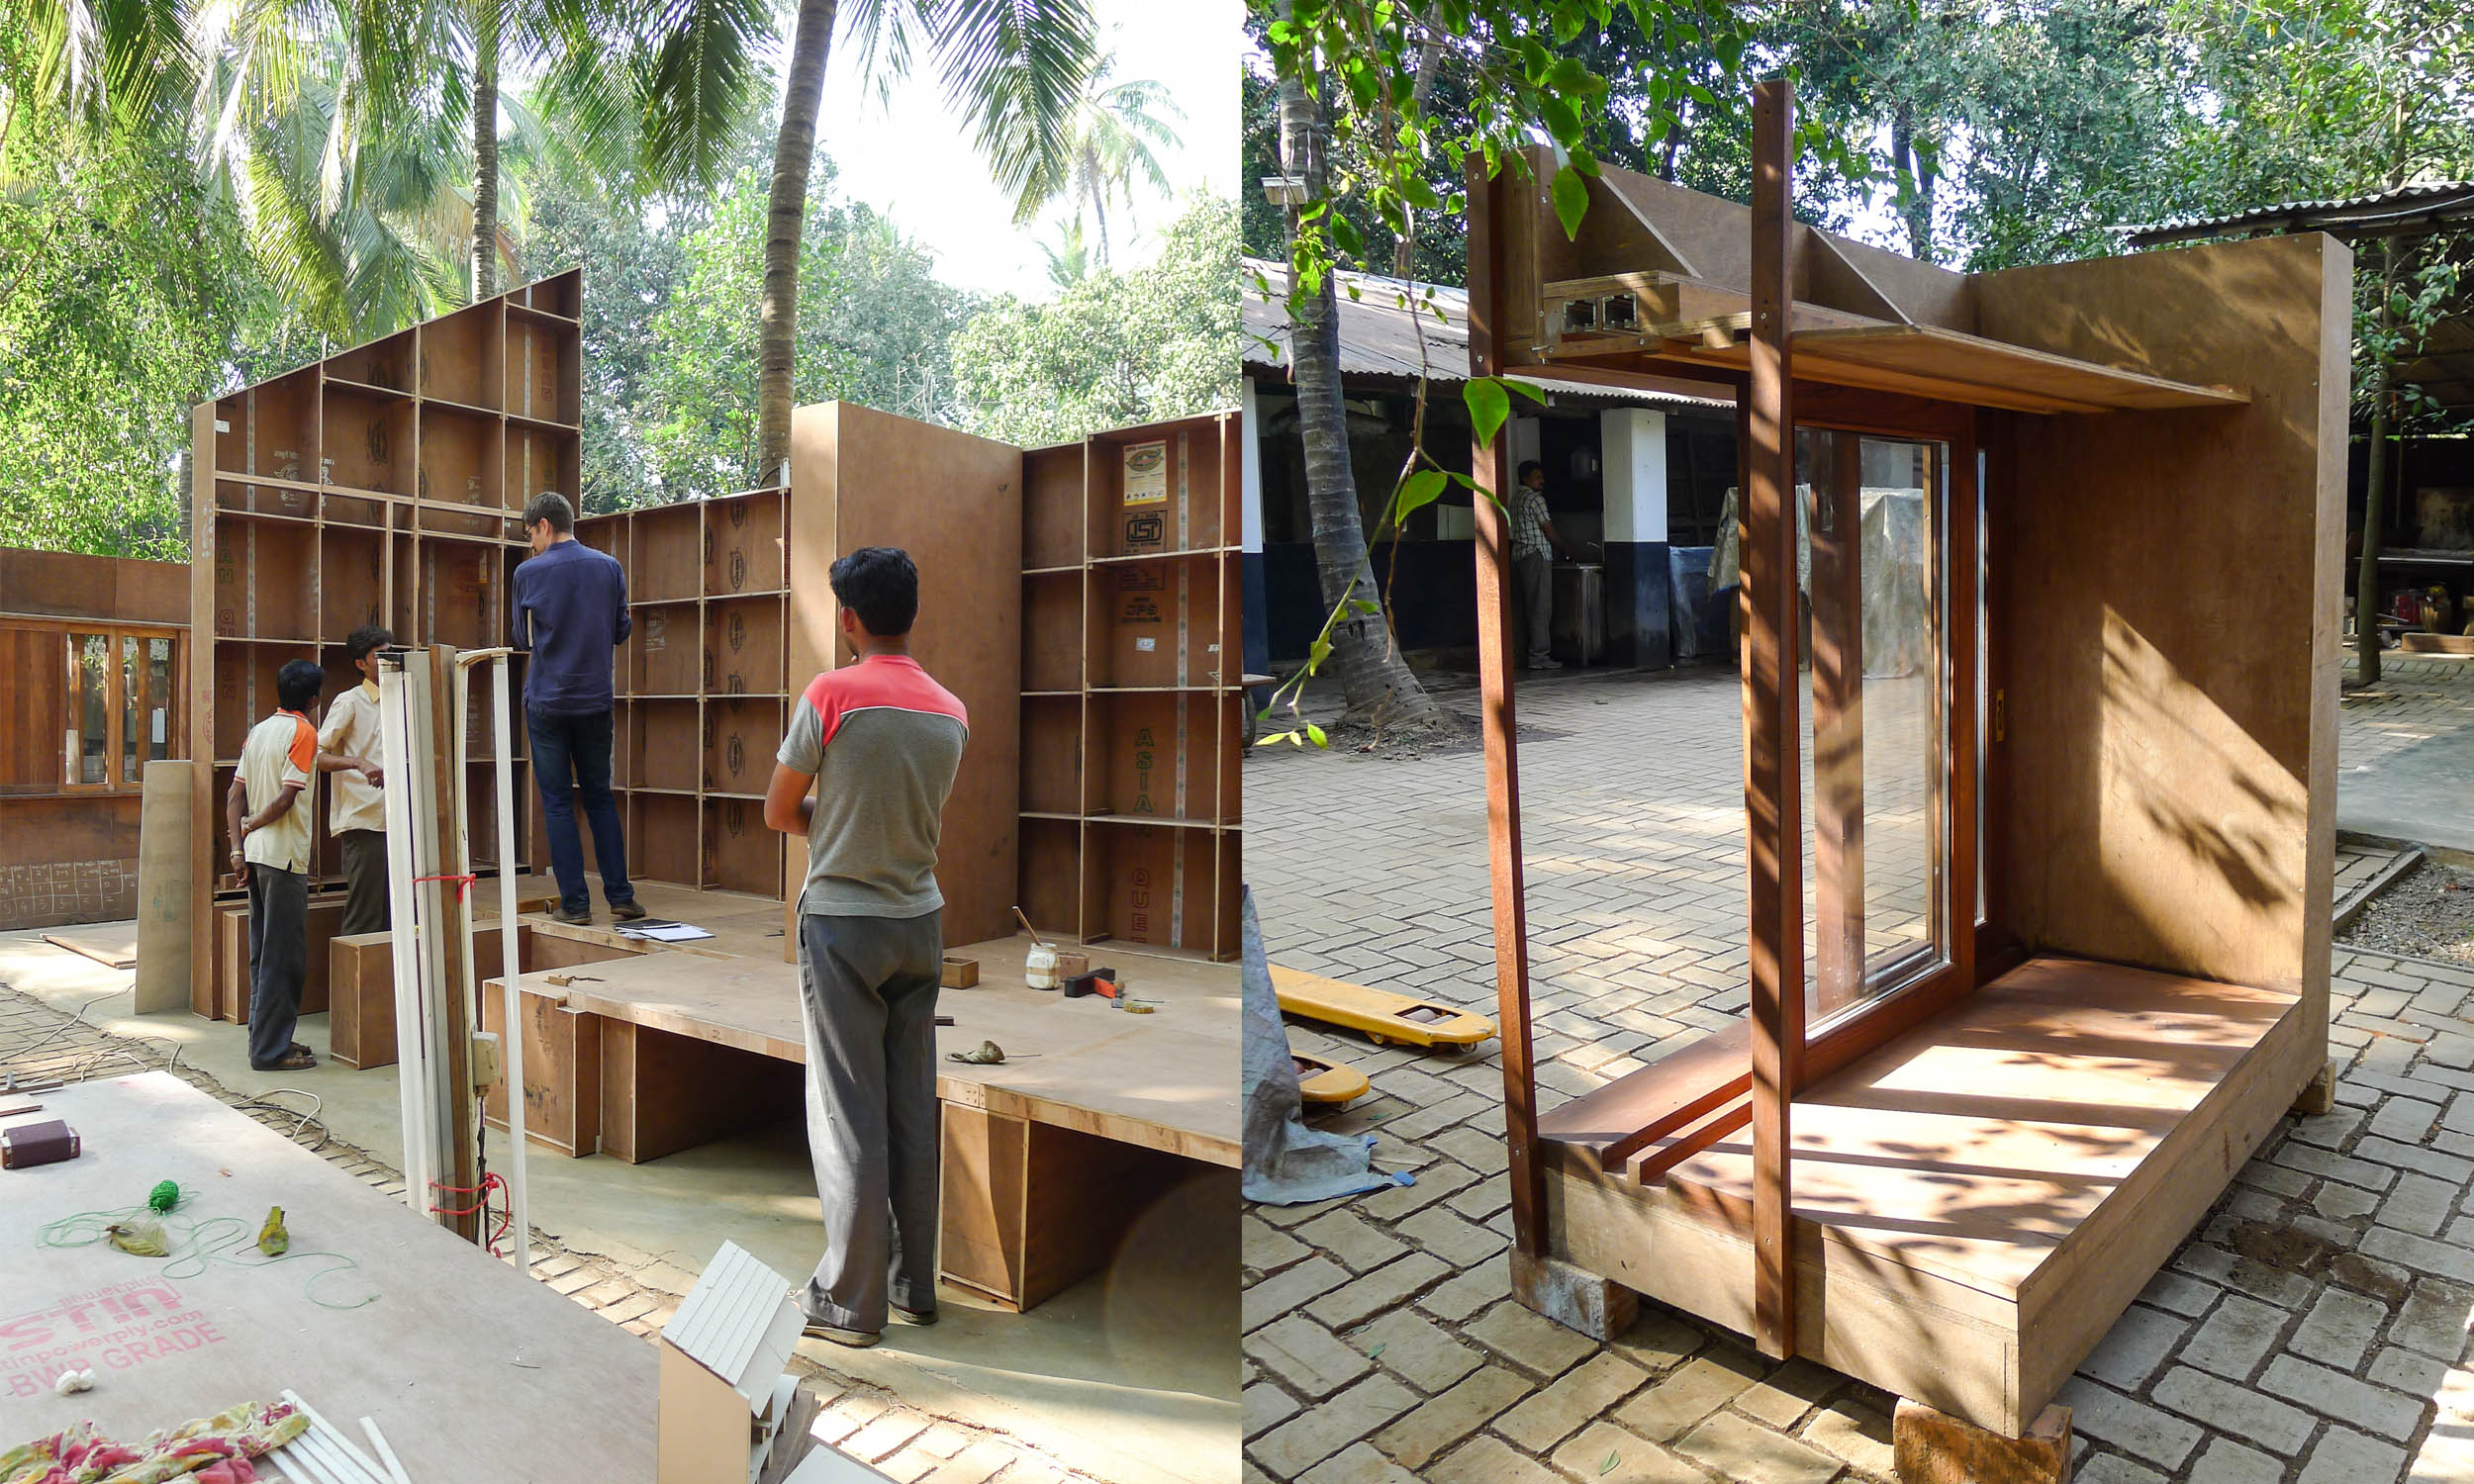 STUDIO MUMBAI_BALVERA HOUSE CONSTRUCTION SITE.jpg